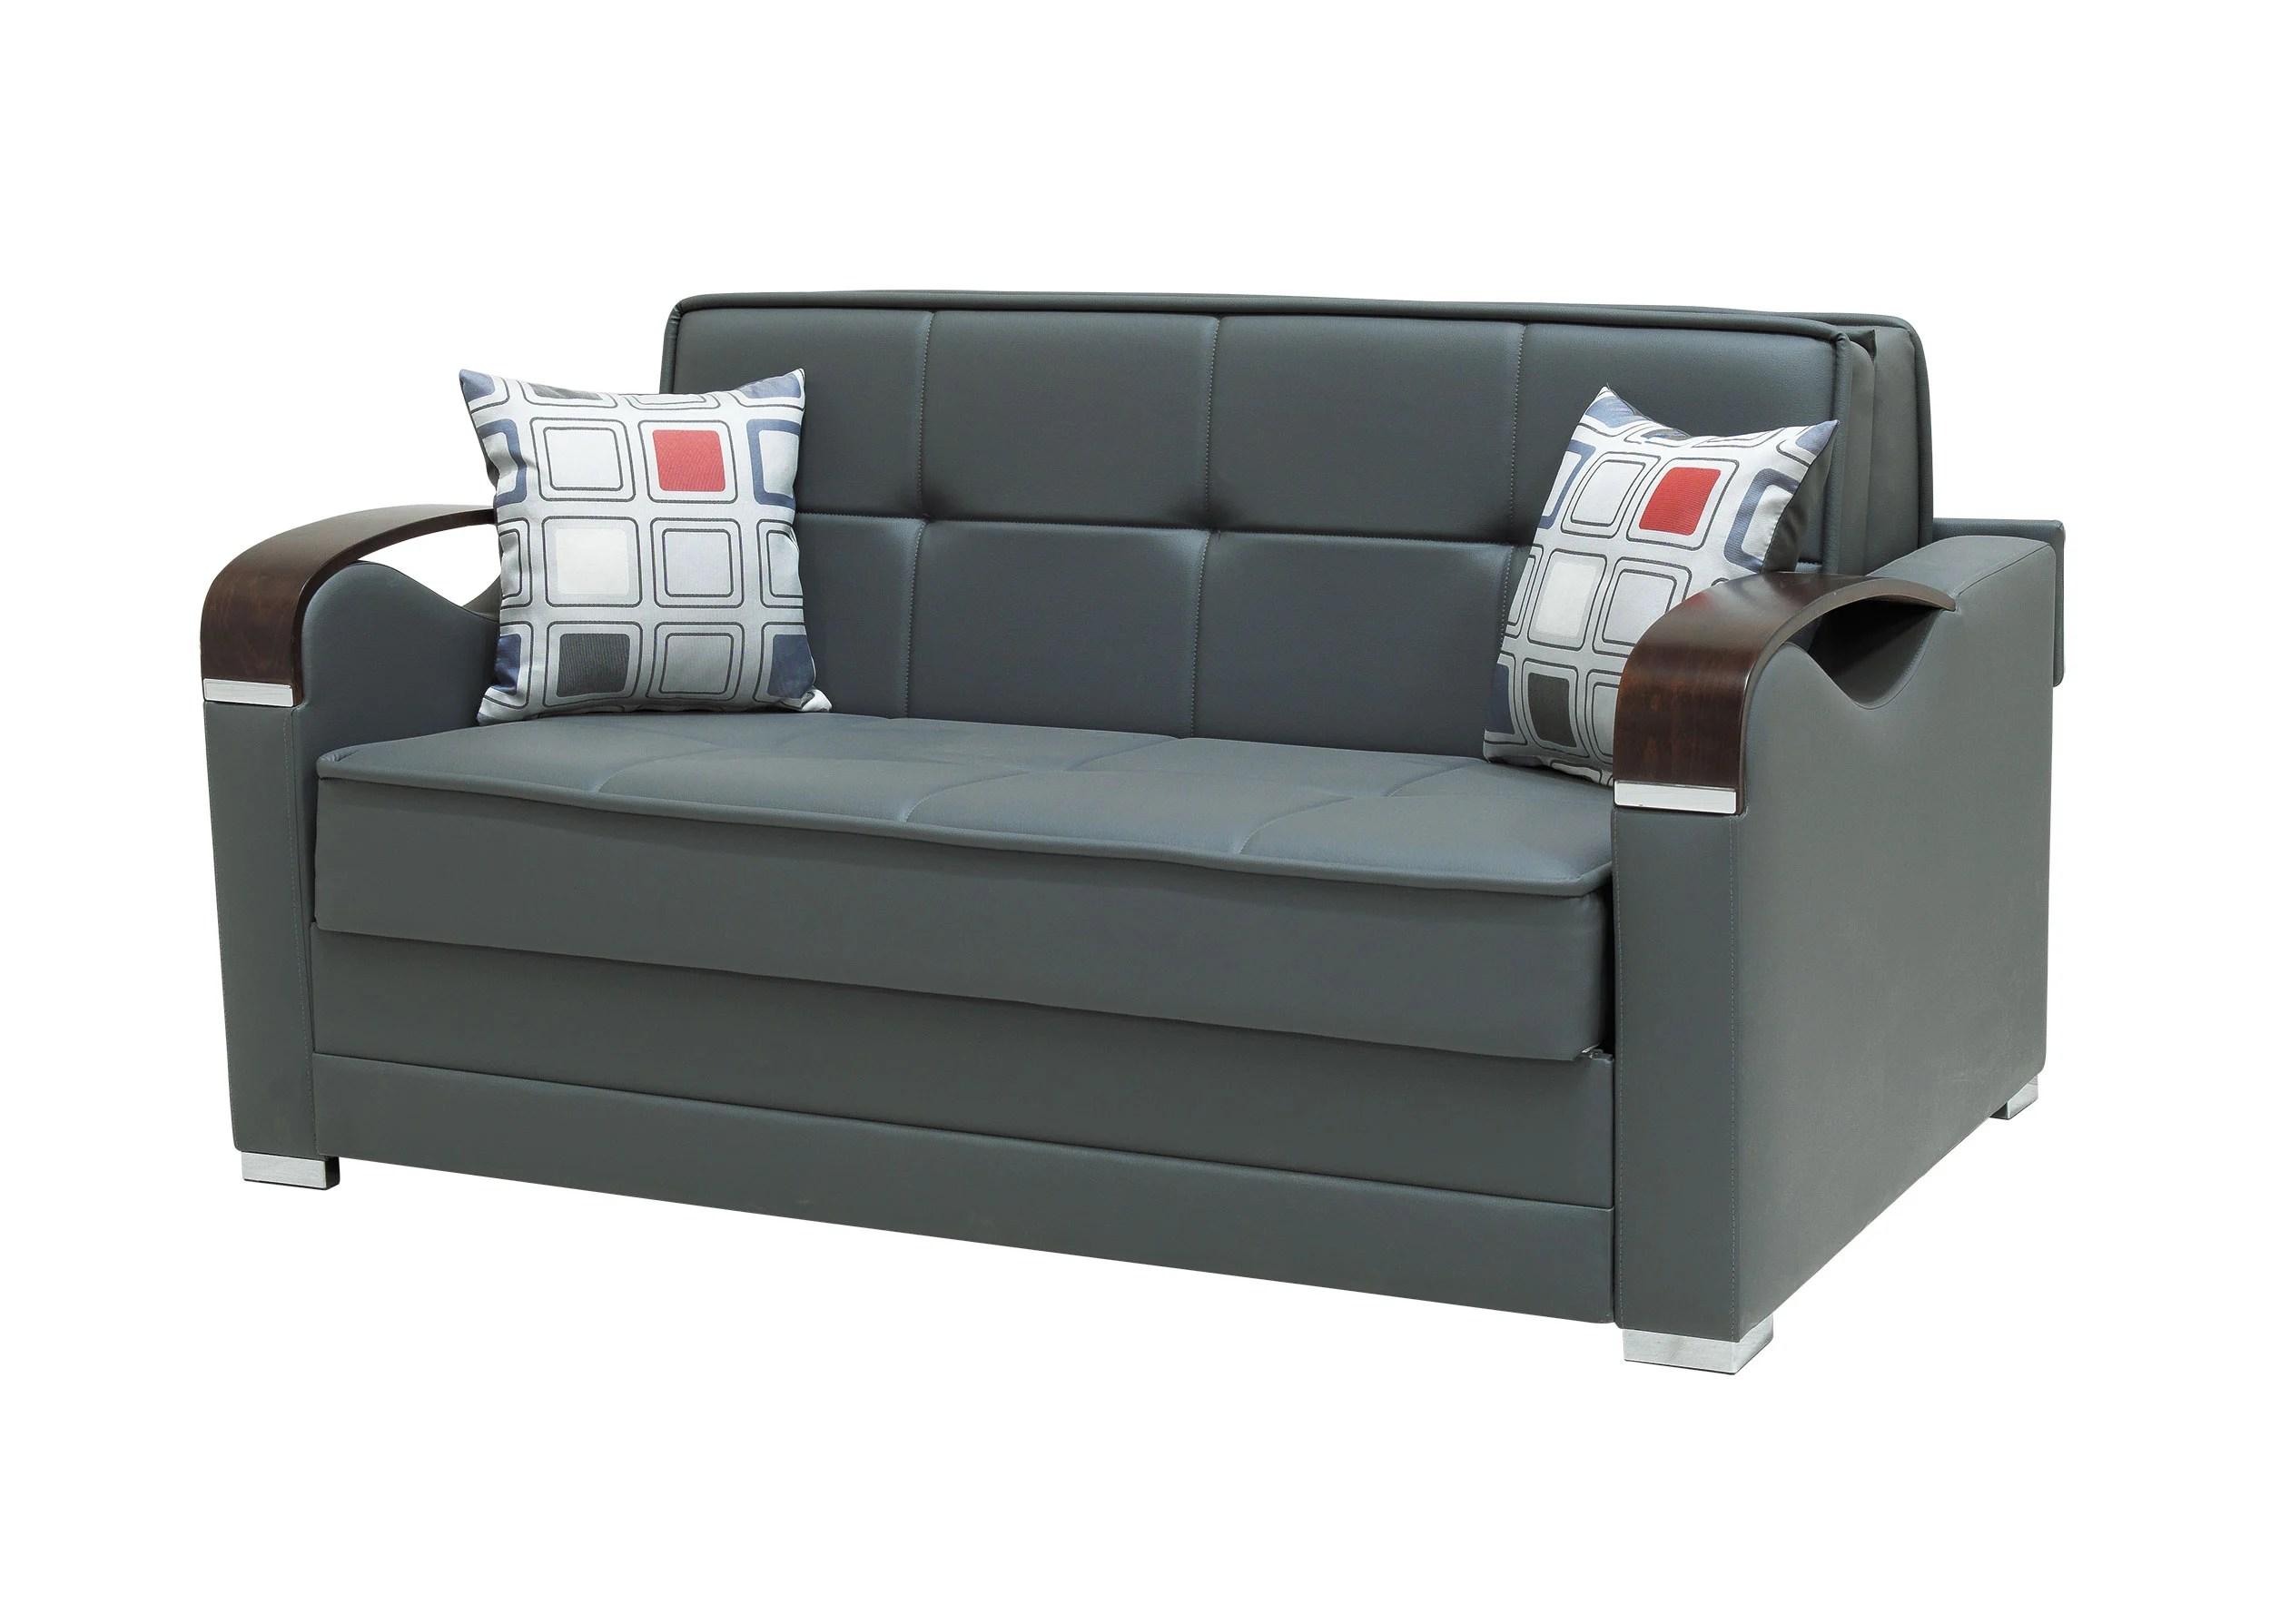 leatherette sofa durability donghia divan etro prime prestige dark gray loveseat bed by